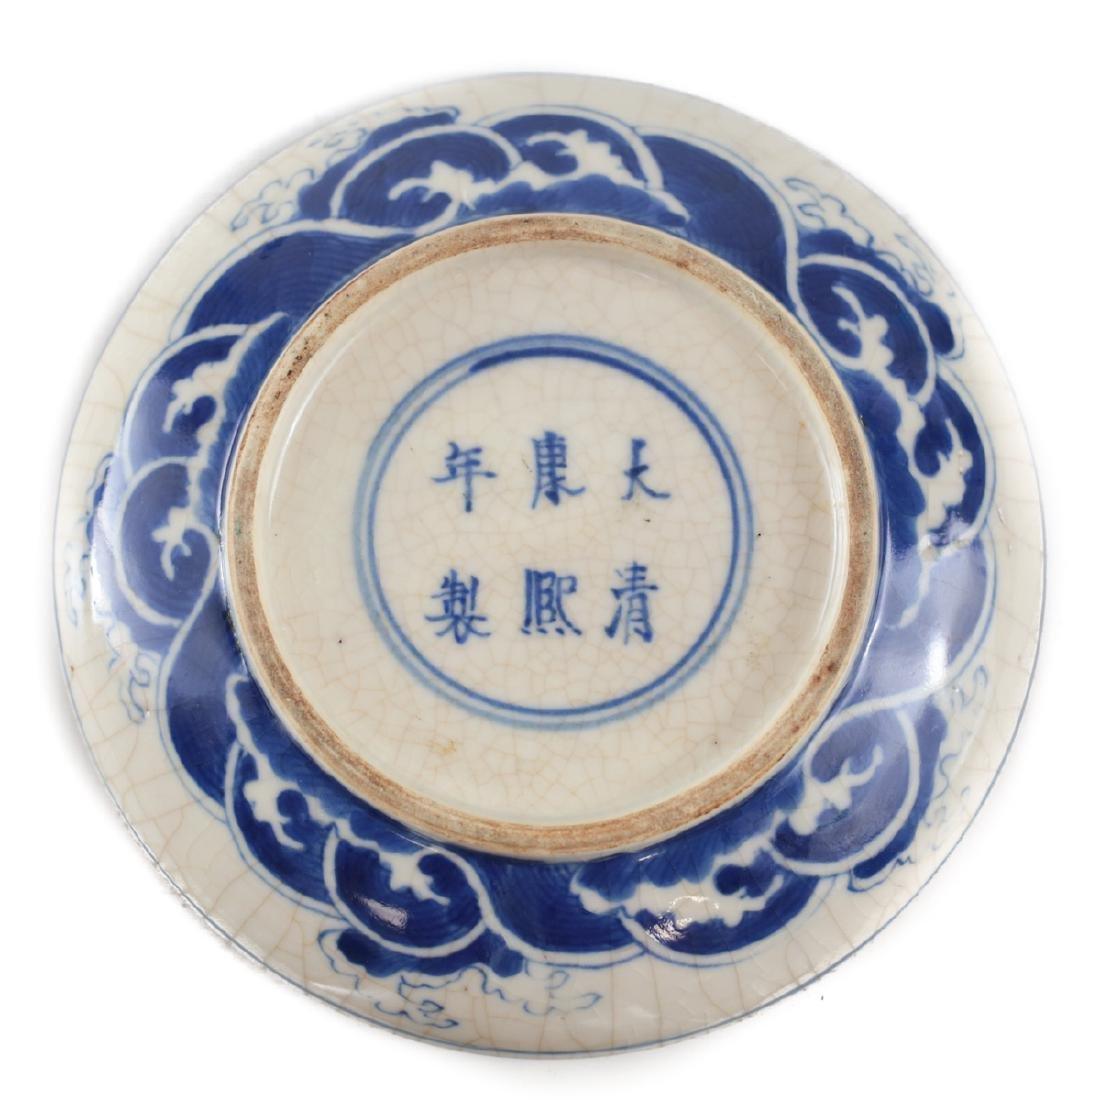 Chinese Porcelain Seal Paste Box - 4